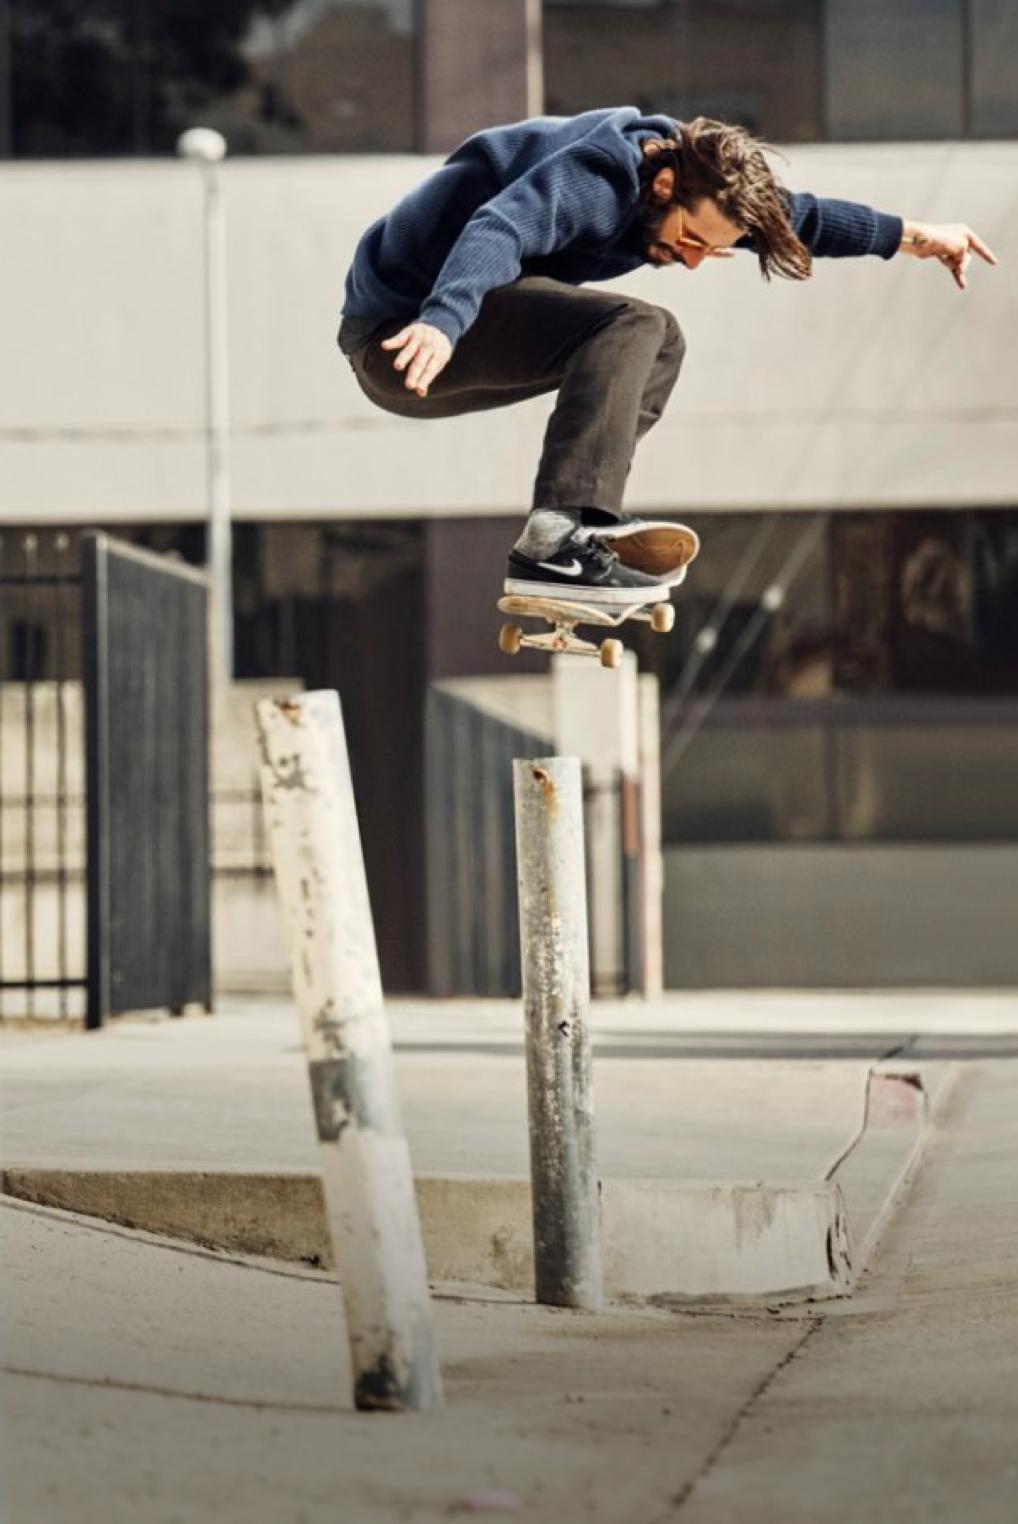 Nike SB Skate Products. Nike.com